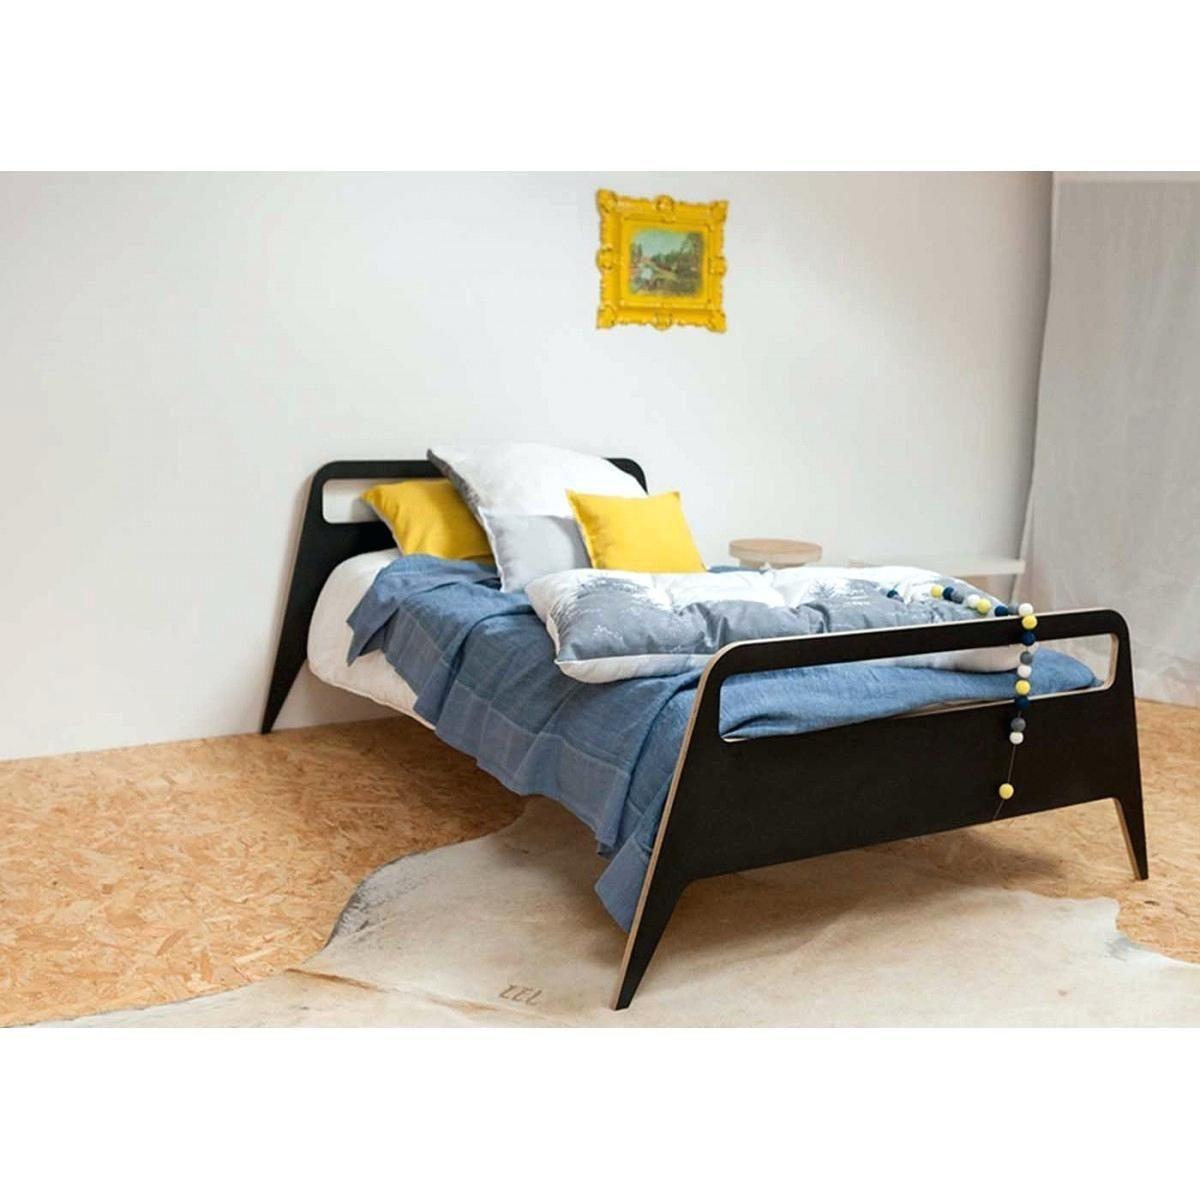 Cadre De Lit 160×200 Ikea Magnifique Cadre Lit Futon Lit 140 Ikea Luxe S Ikea Matratzen Garantie Mit